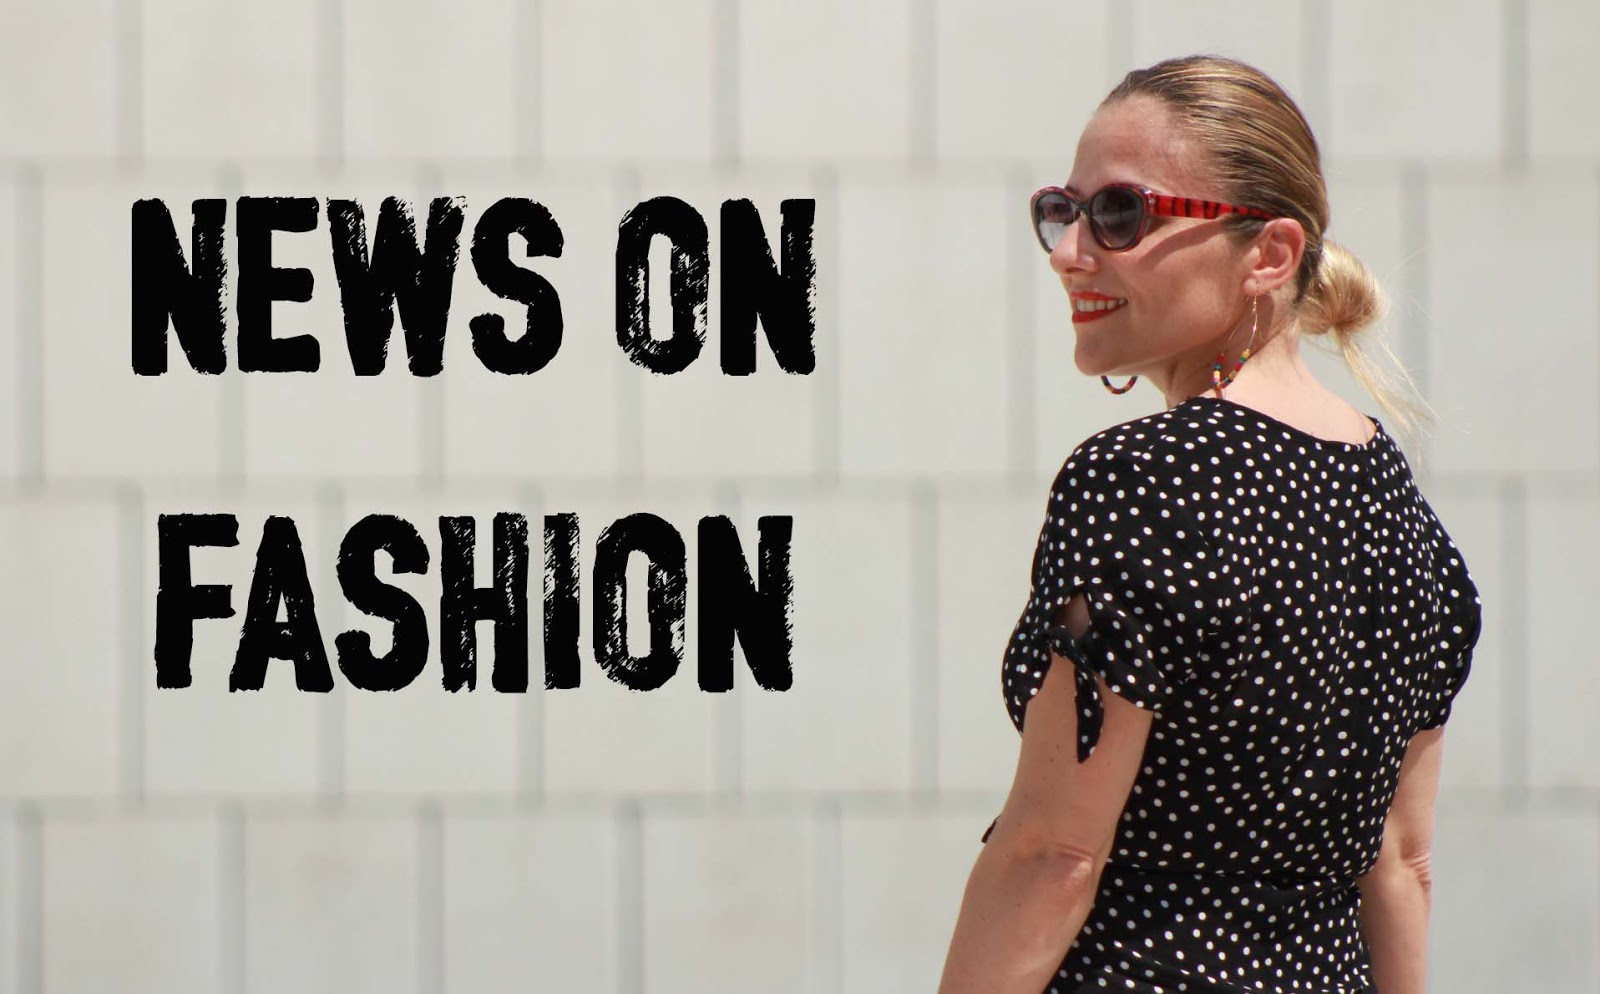 Eniwhere Fashion - News on Fashion - August 2018